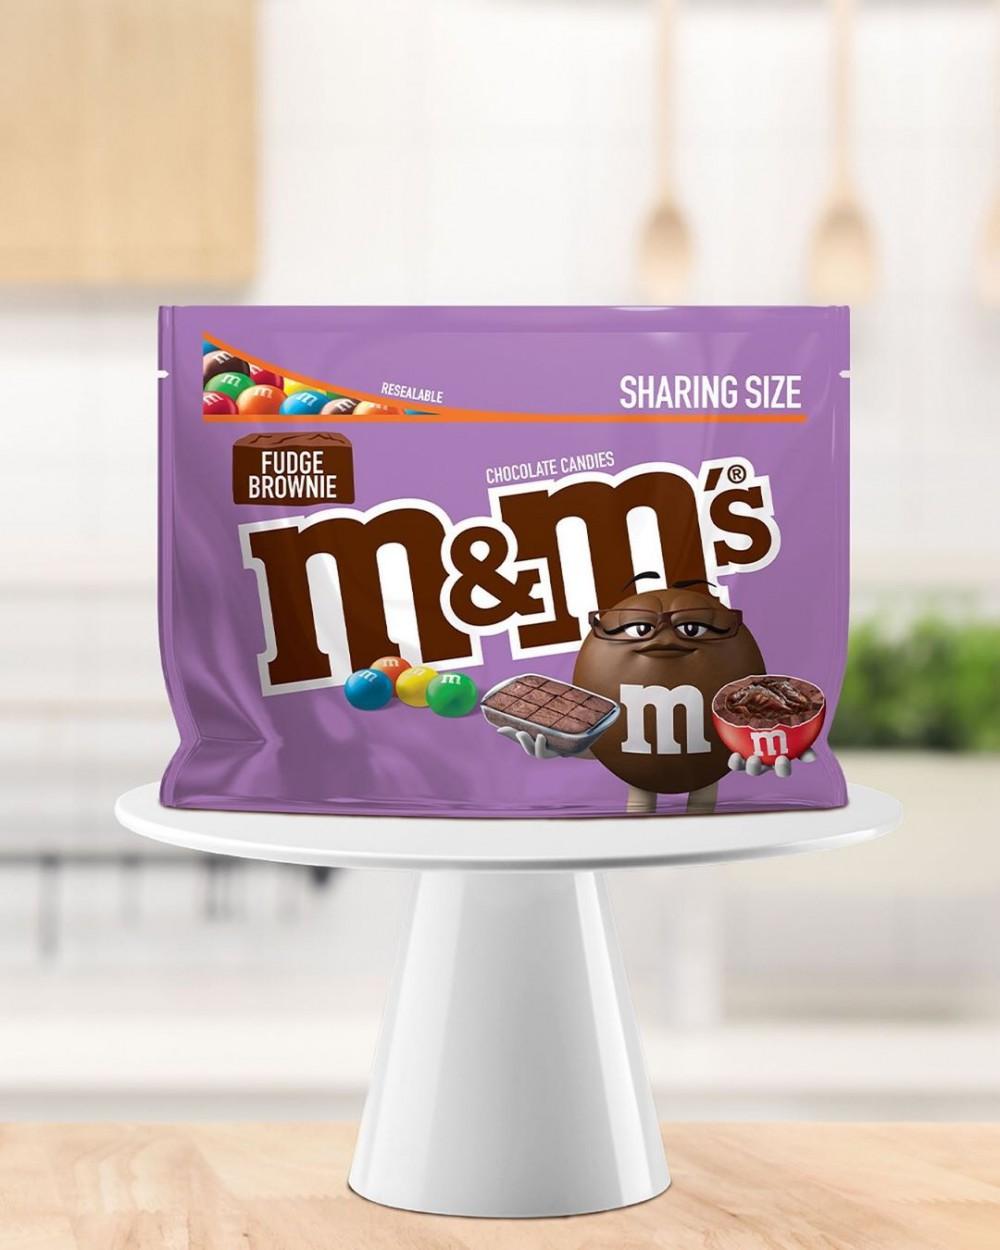 M&M'S 朱古力4月推出Fudge Brownies布朗尼蛋糕新口味